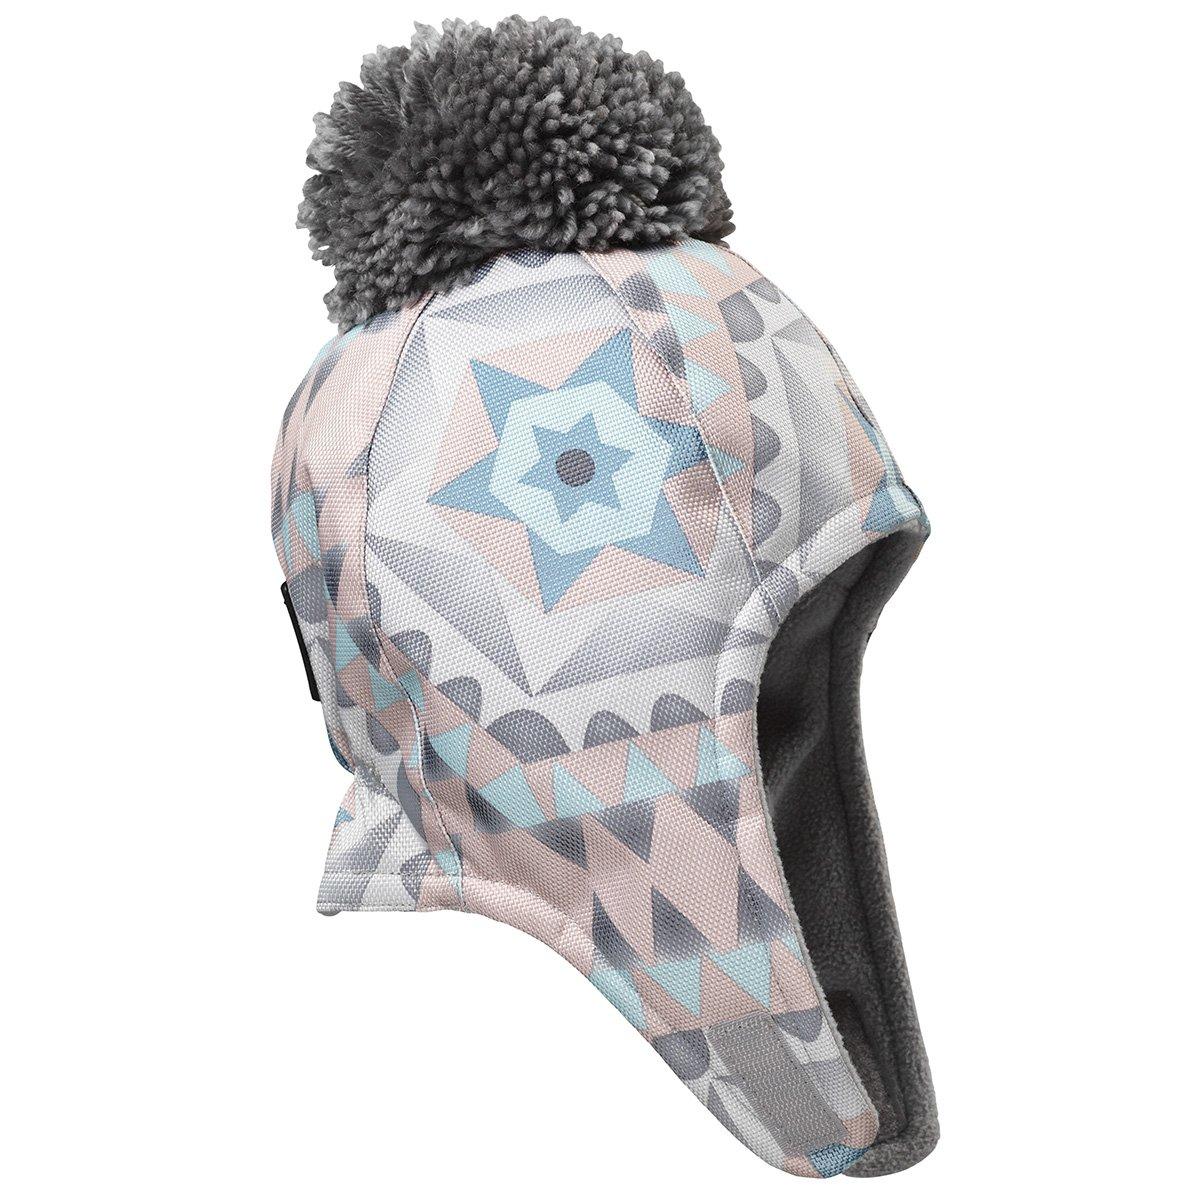 Elodie Details 103497.0 Shapka Bonnet Casquette Bedouin Stories 6-12 m ELODIEHATBEDOUIN6-12M